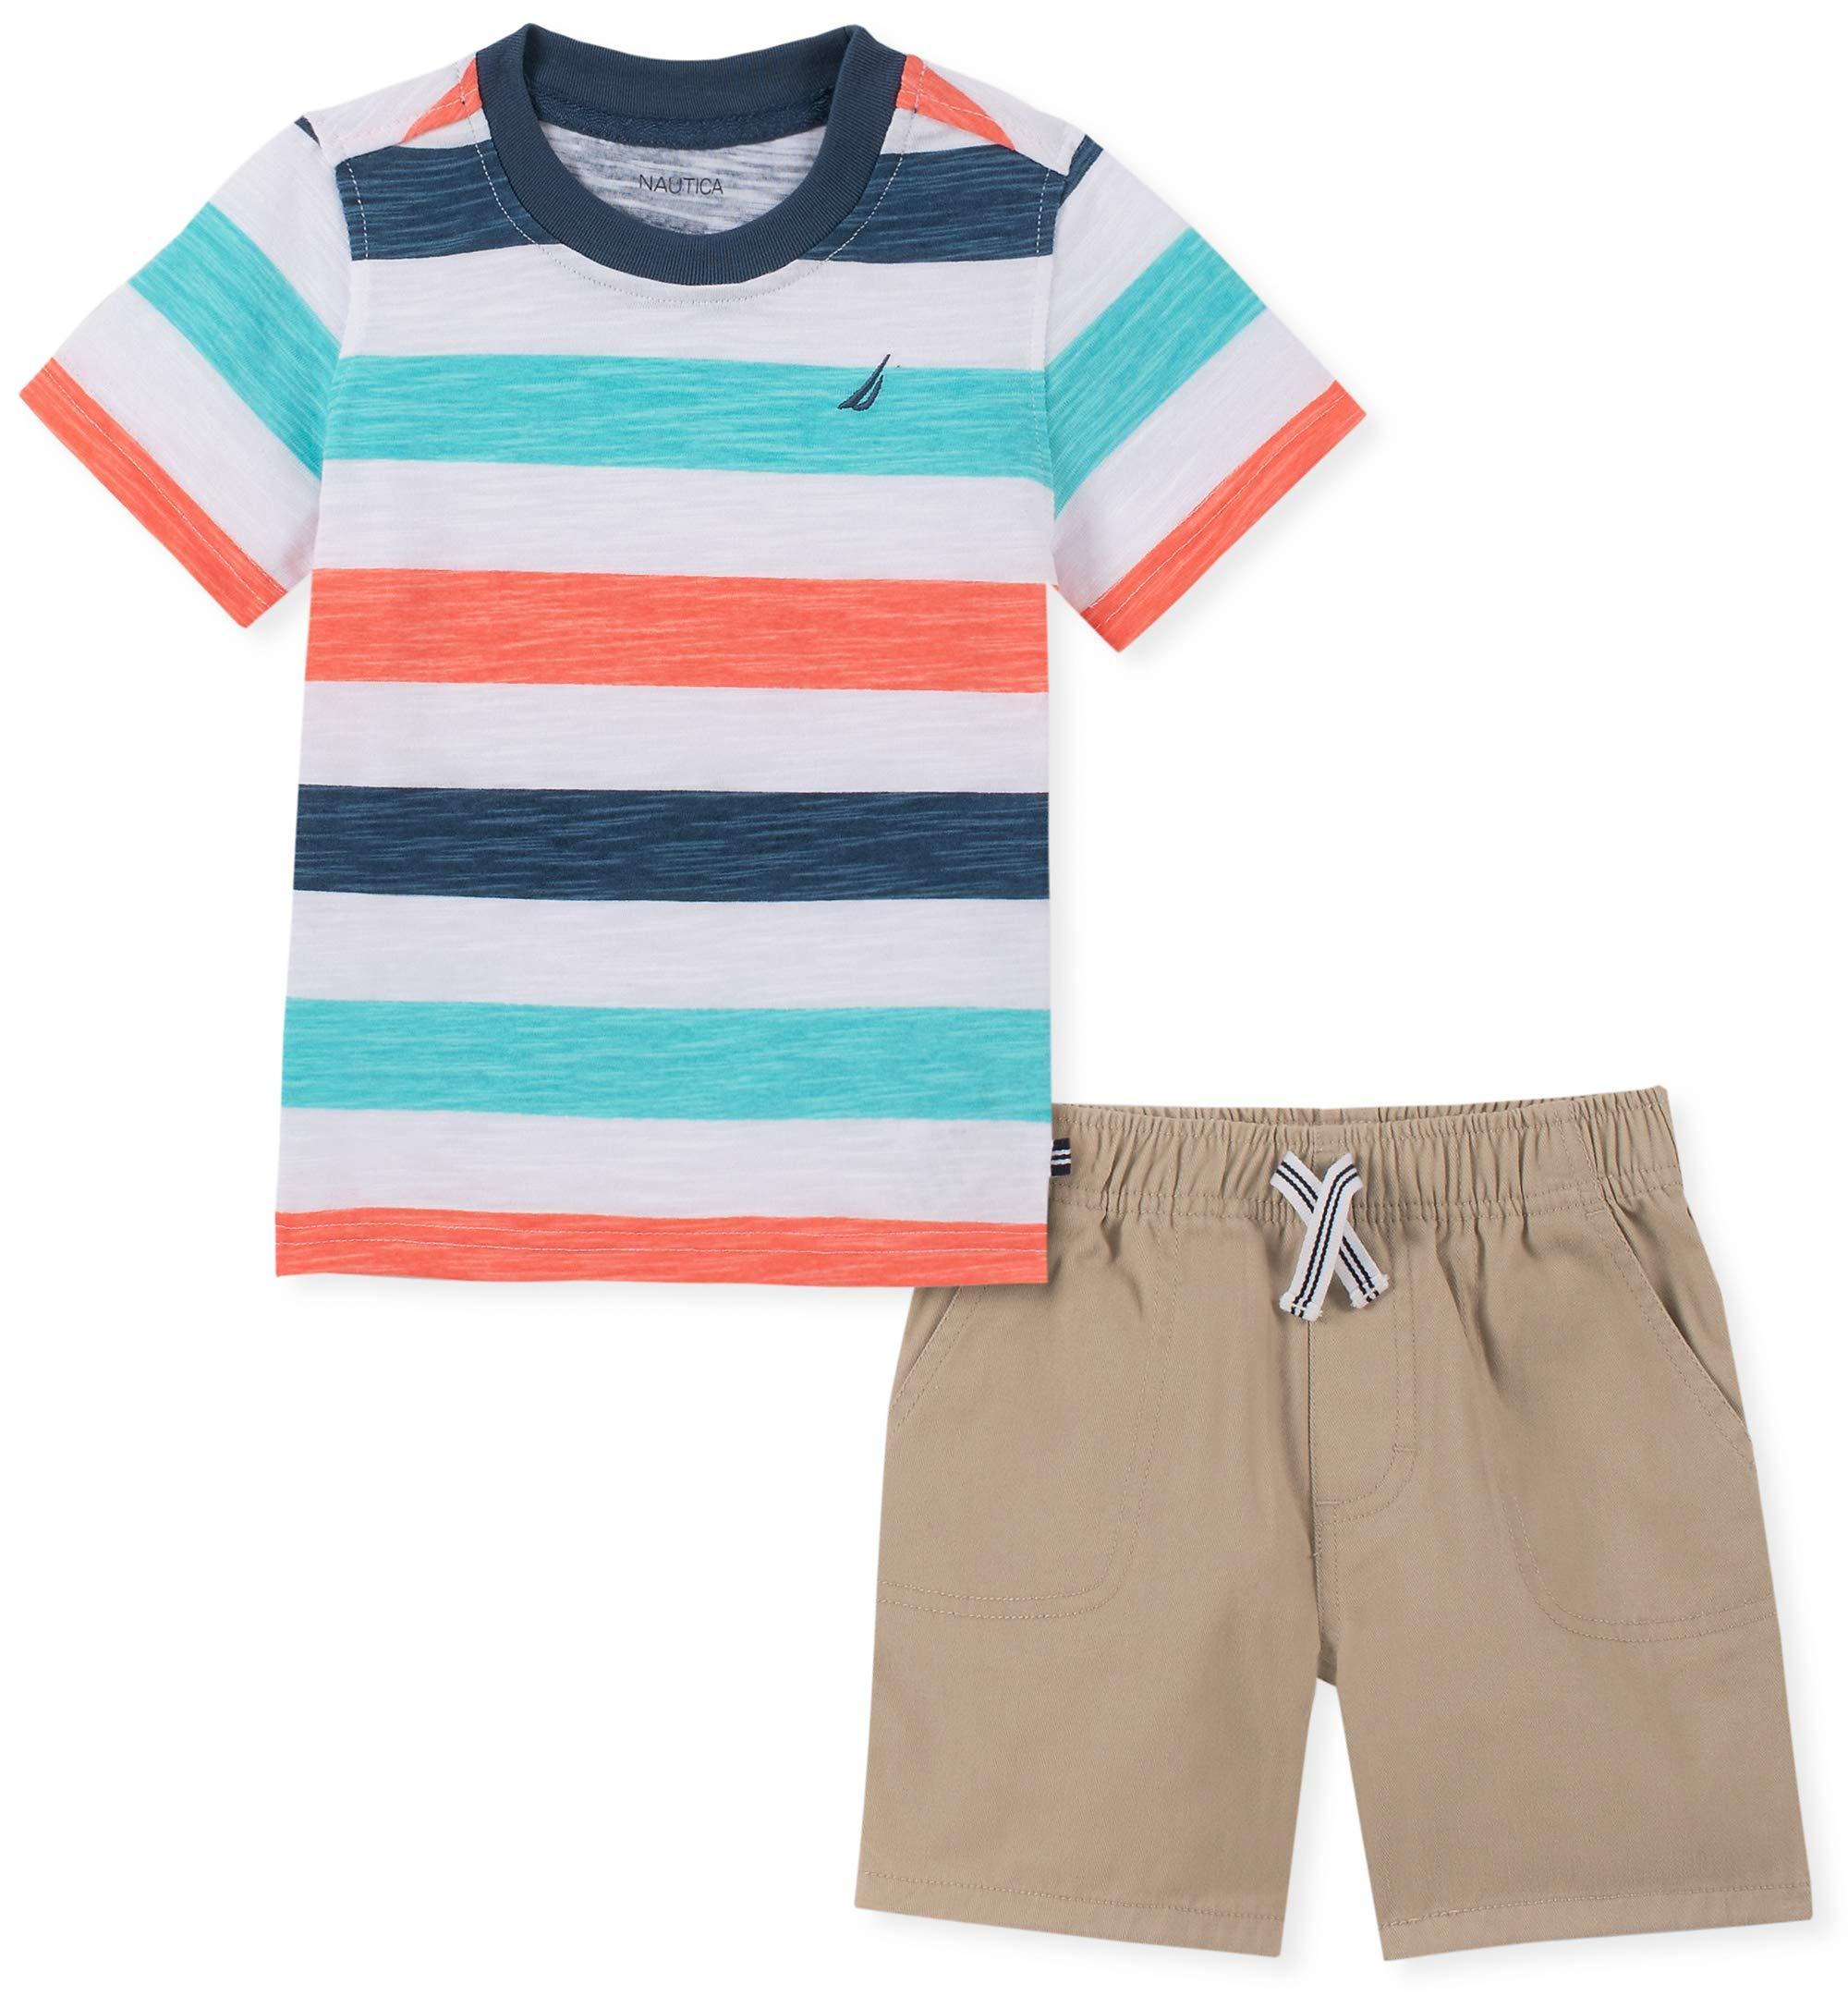 Nautica Sets (KHQ) Boys' Toddler 2 Pieces Shorts Set, Navy/Orange Stripes 3T